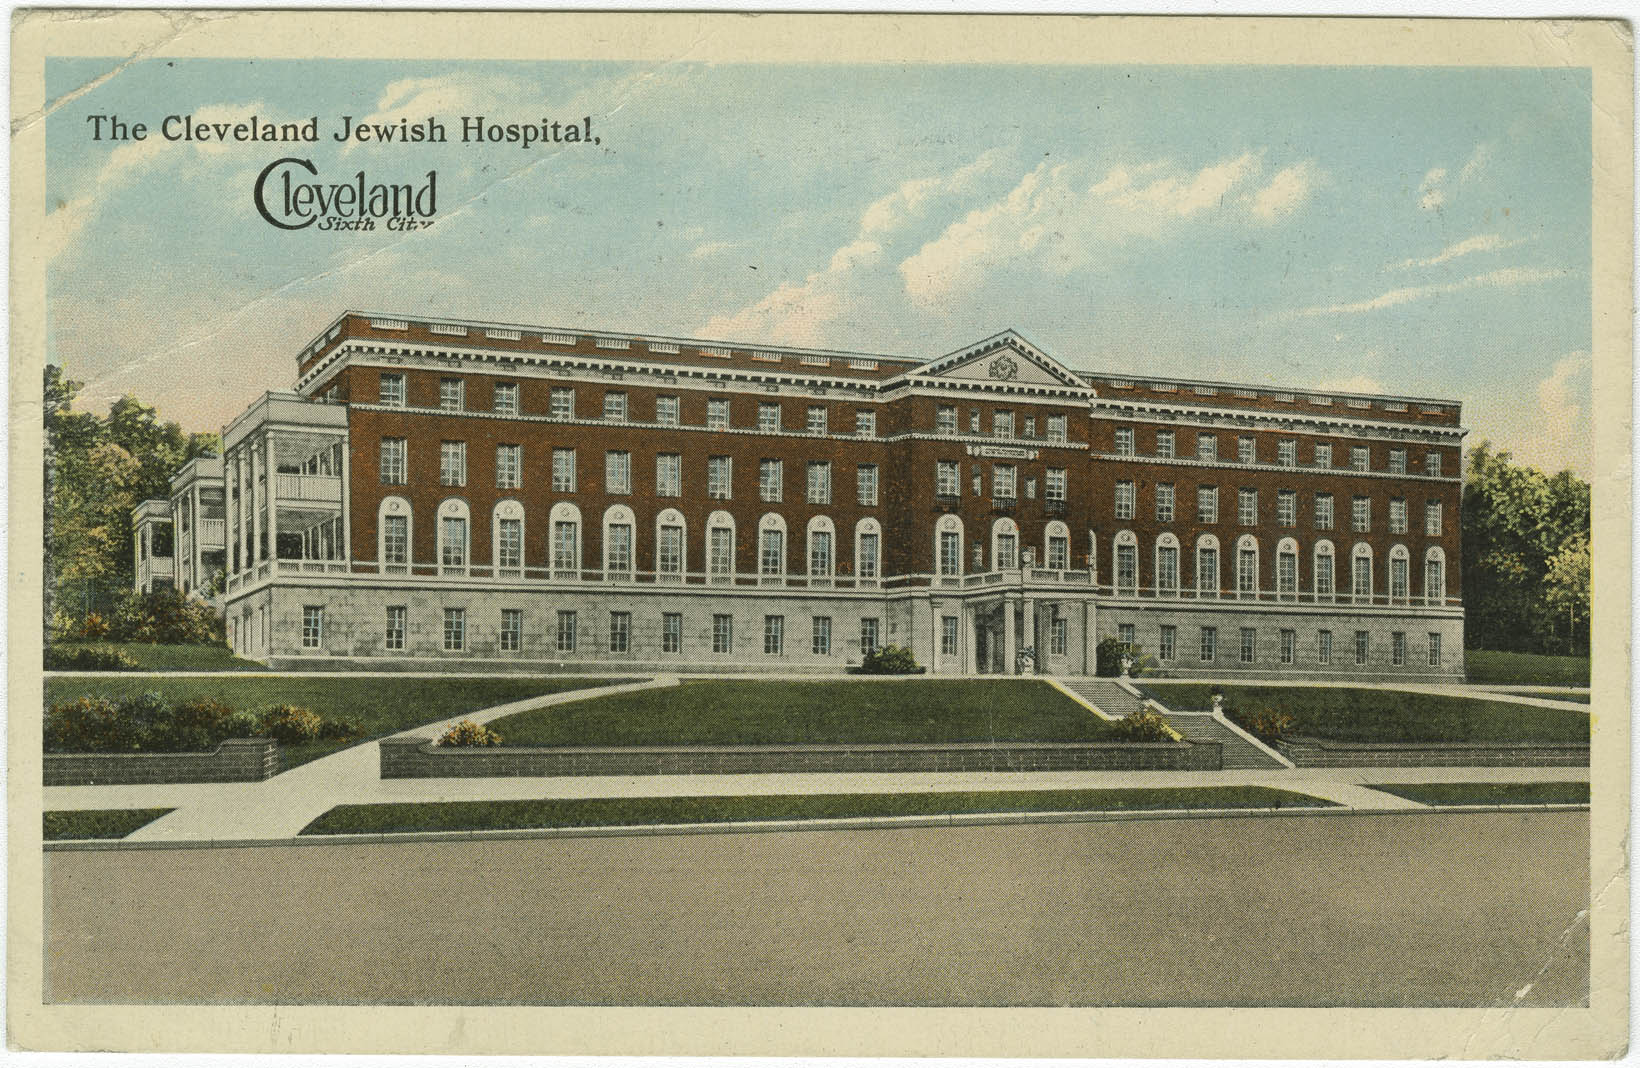 The Cleveland Jewish Hospital